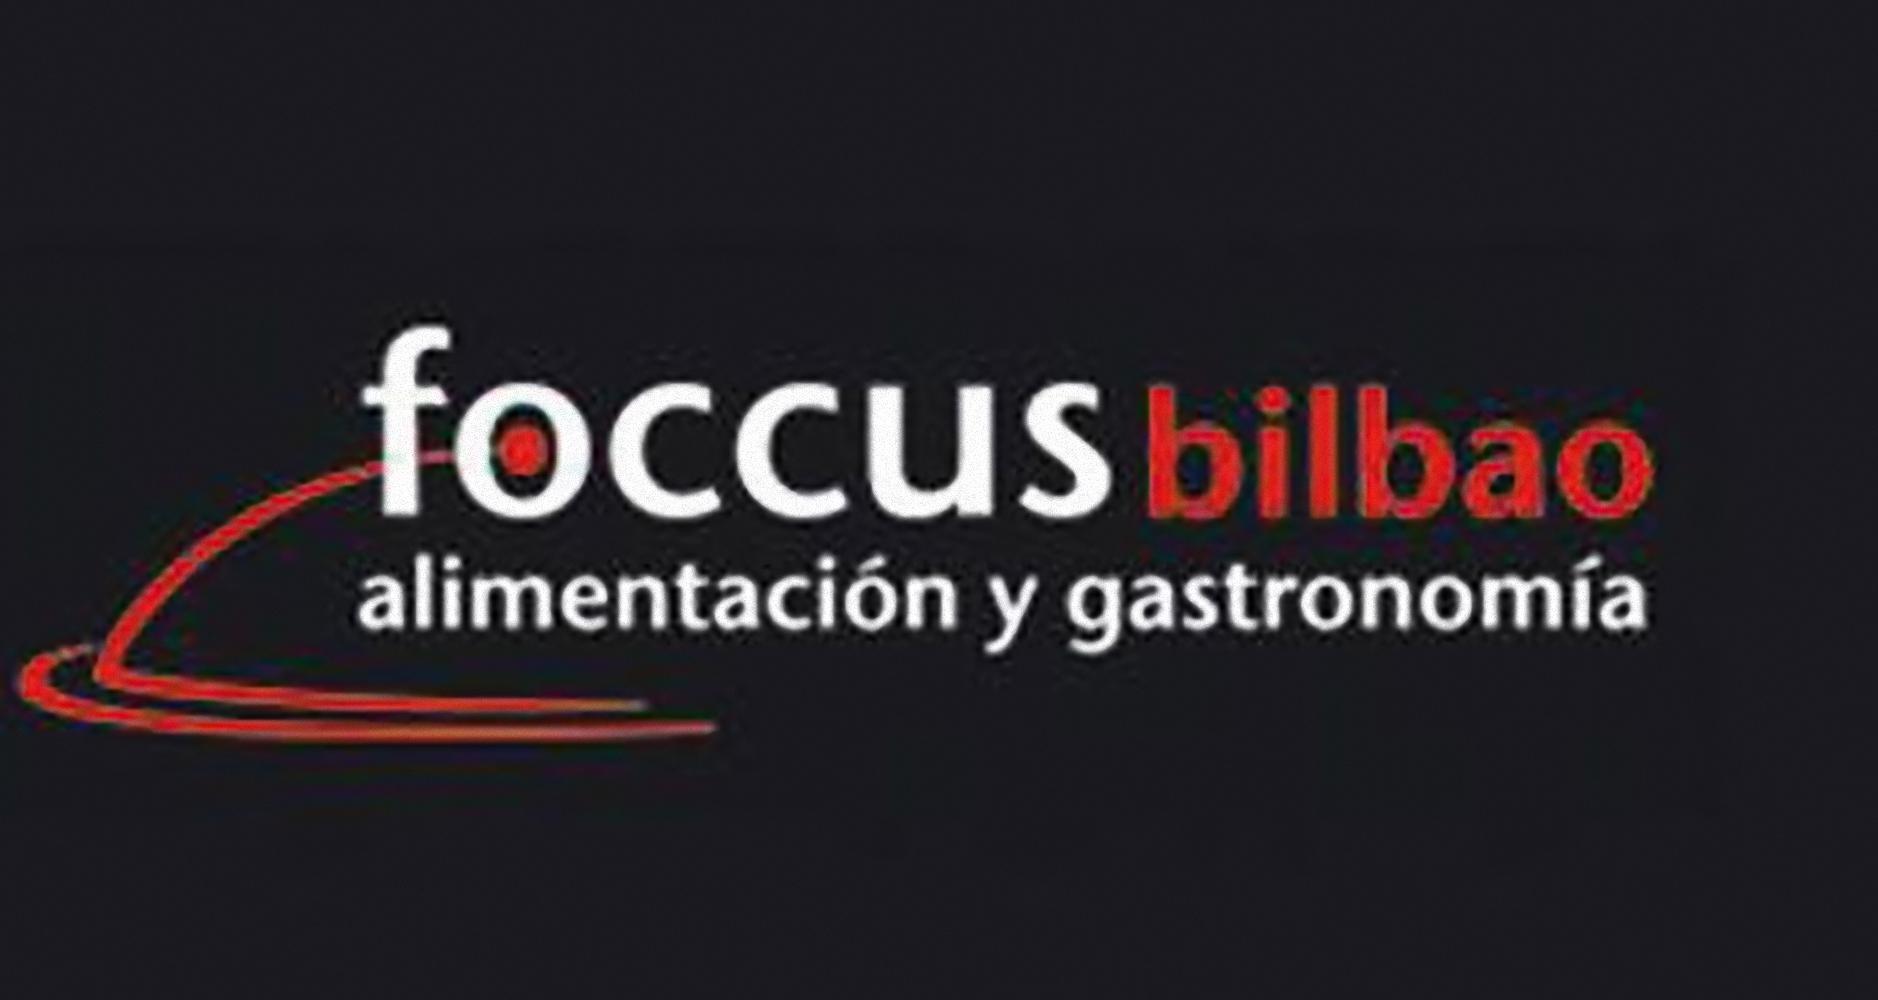 Foccus Bilbao 2012